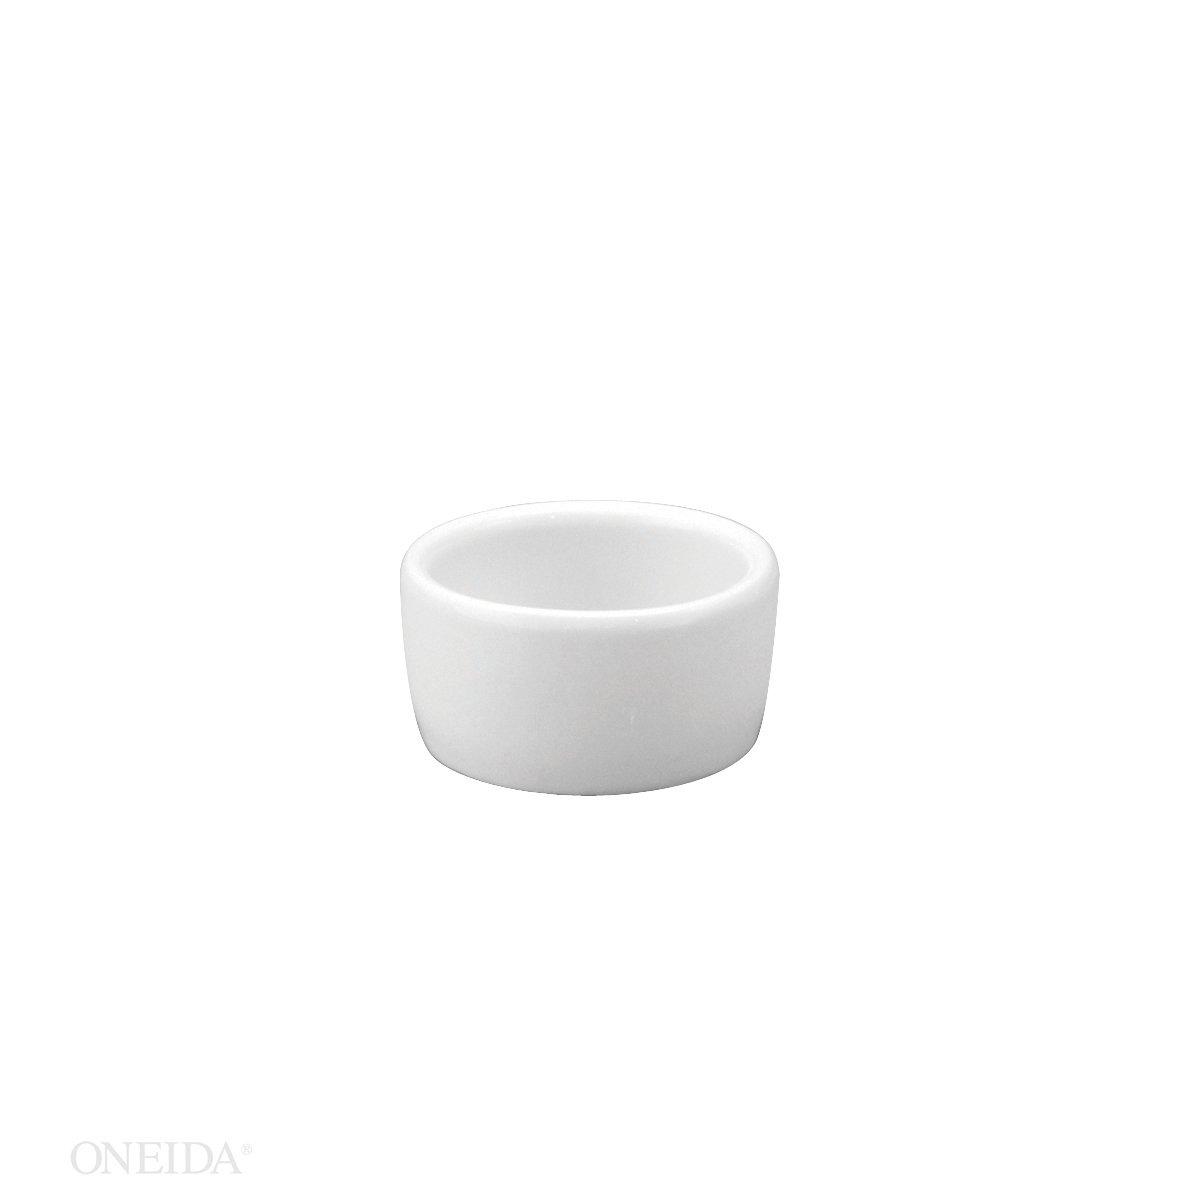 Oneida Foodservice F8000000613 Bright White Ramekin 3 1/2 Oz (Set of 36)